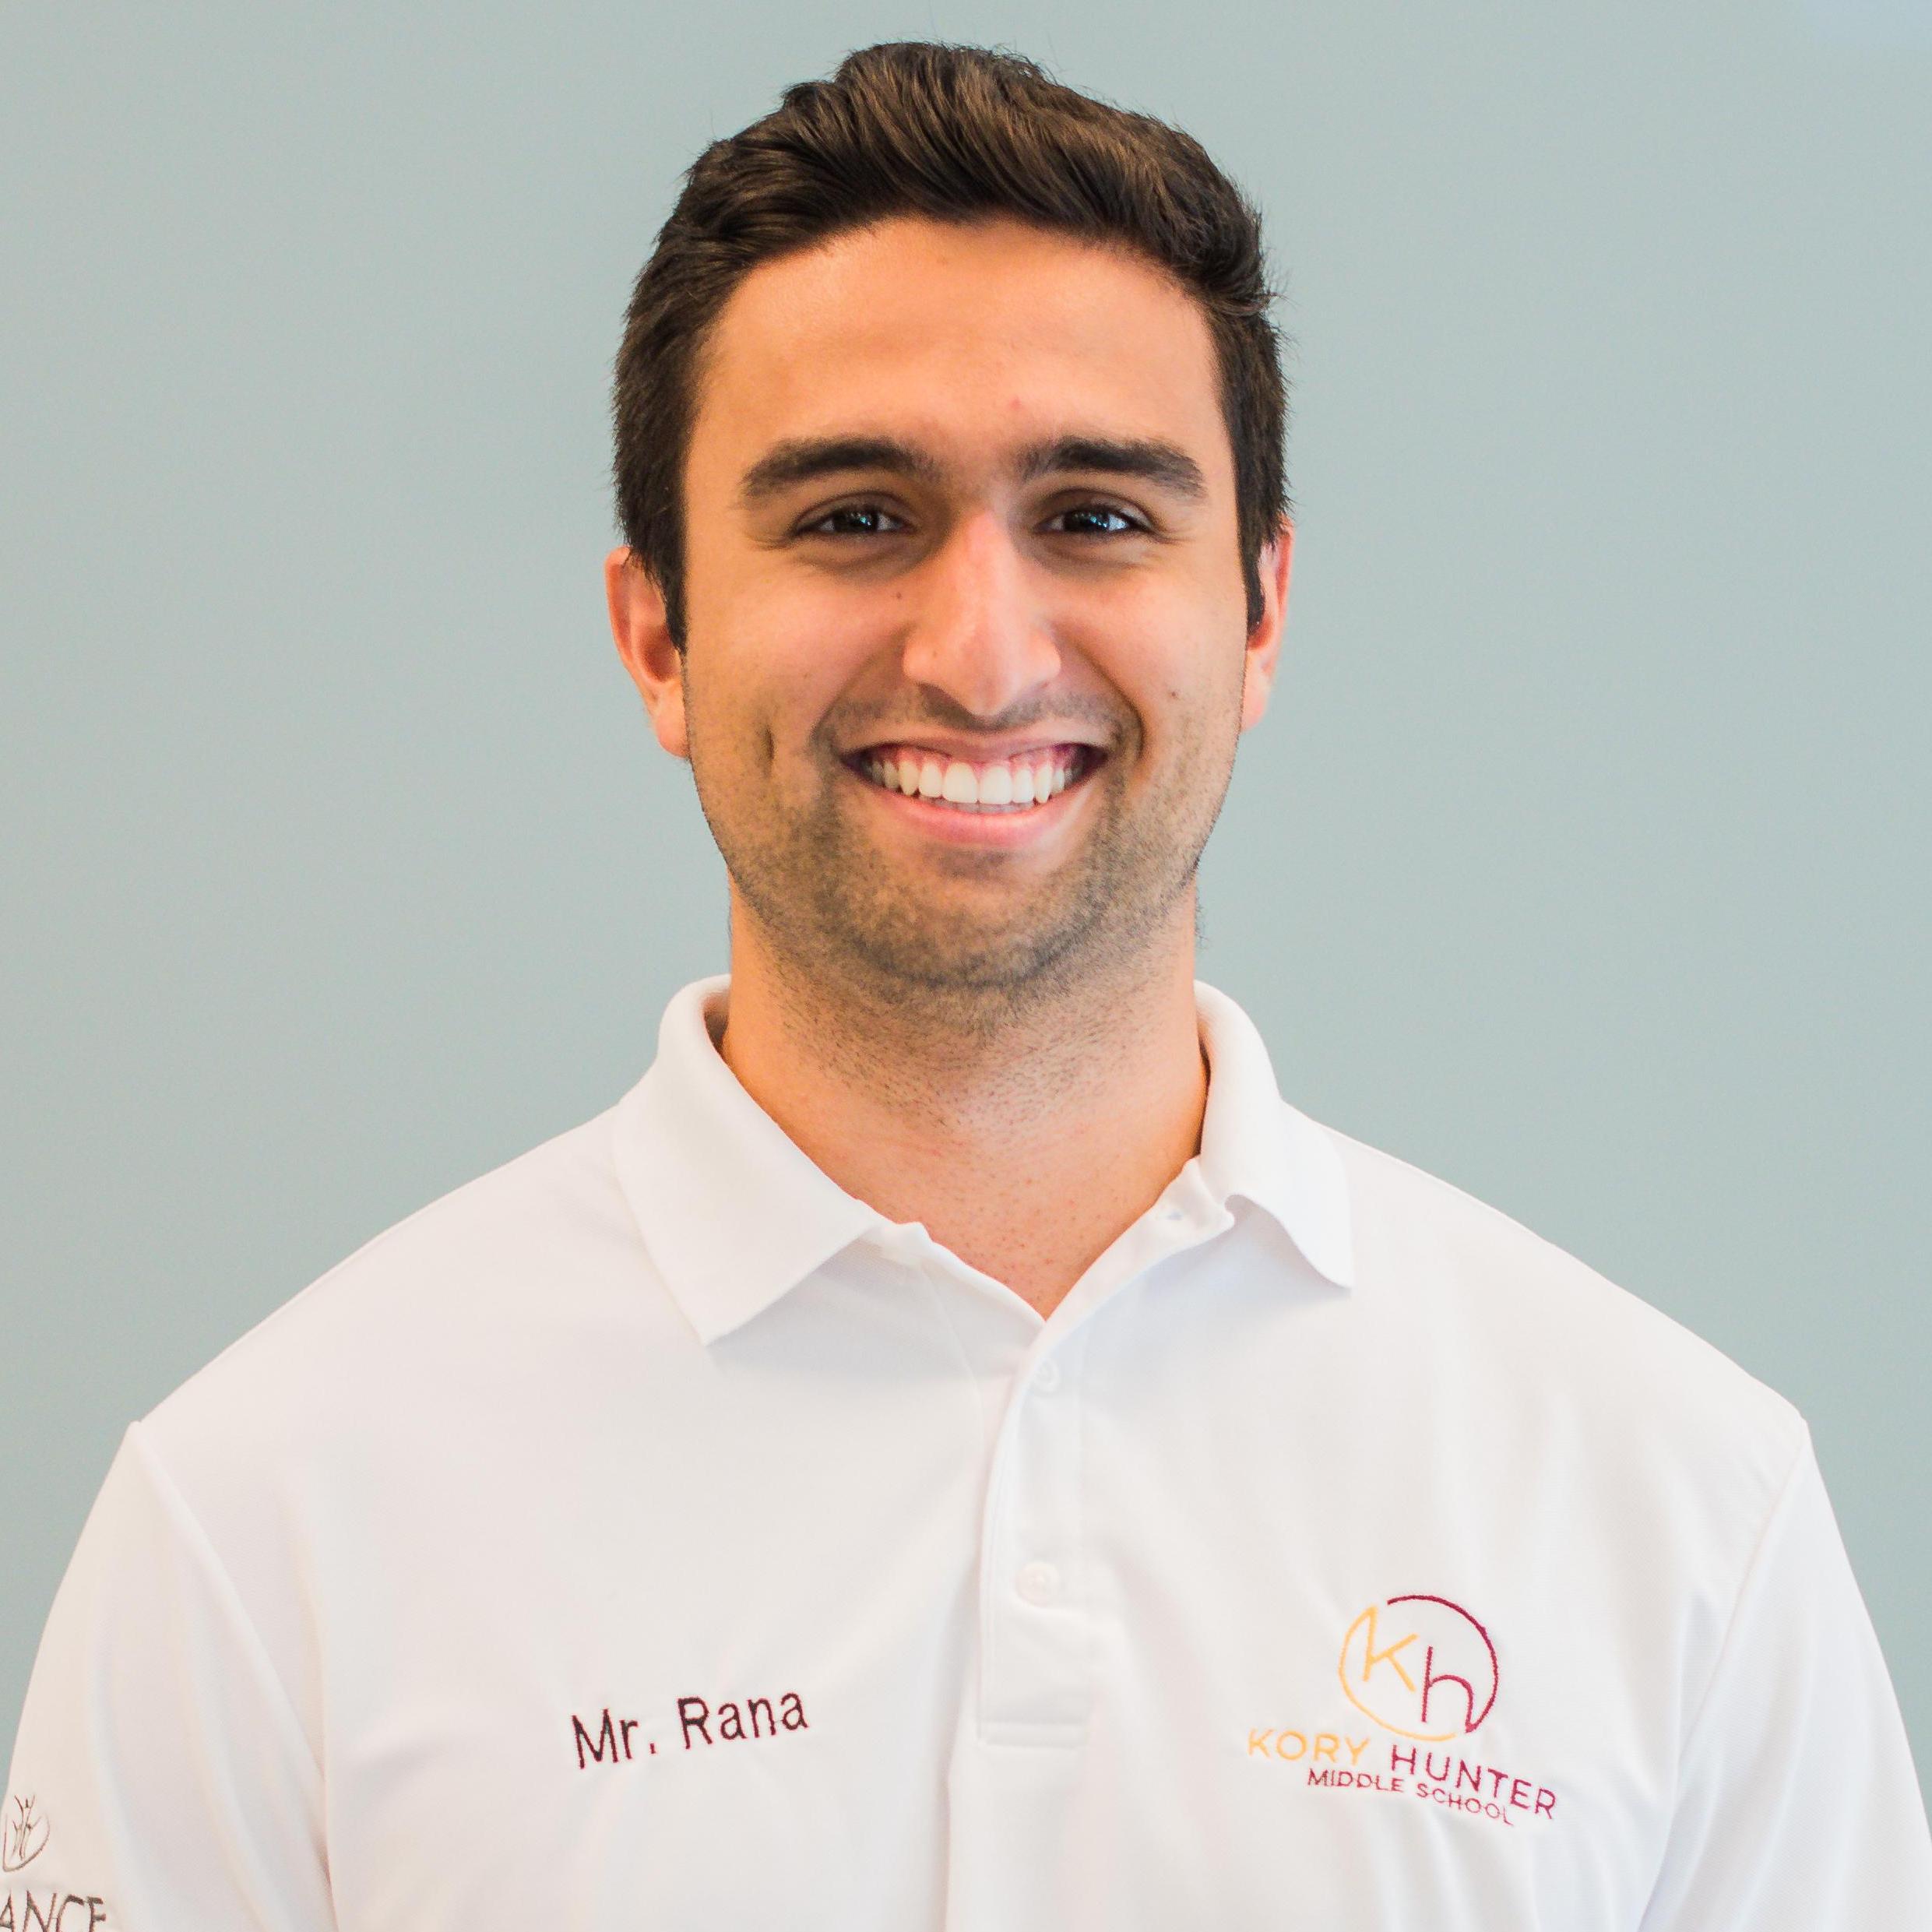 Zach Rana's Profile Photo